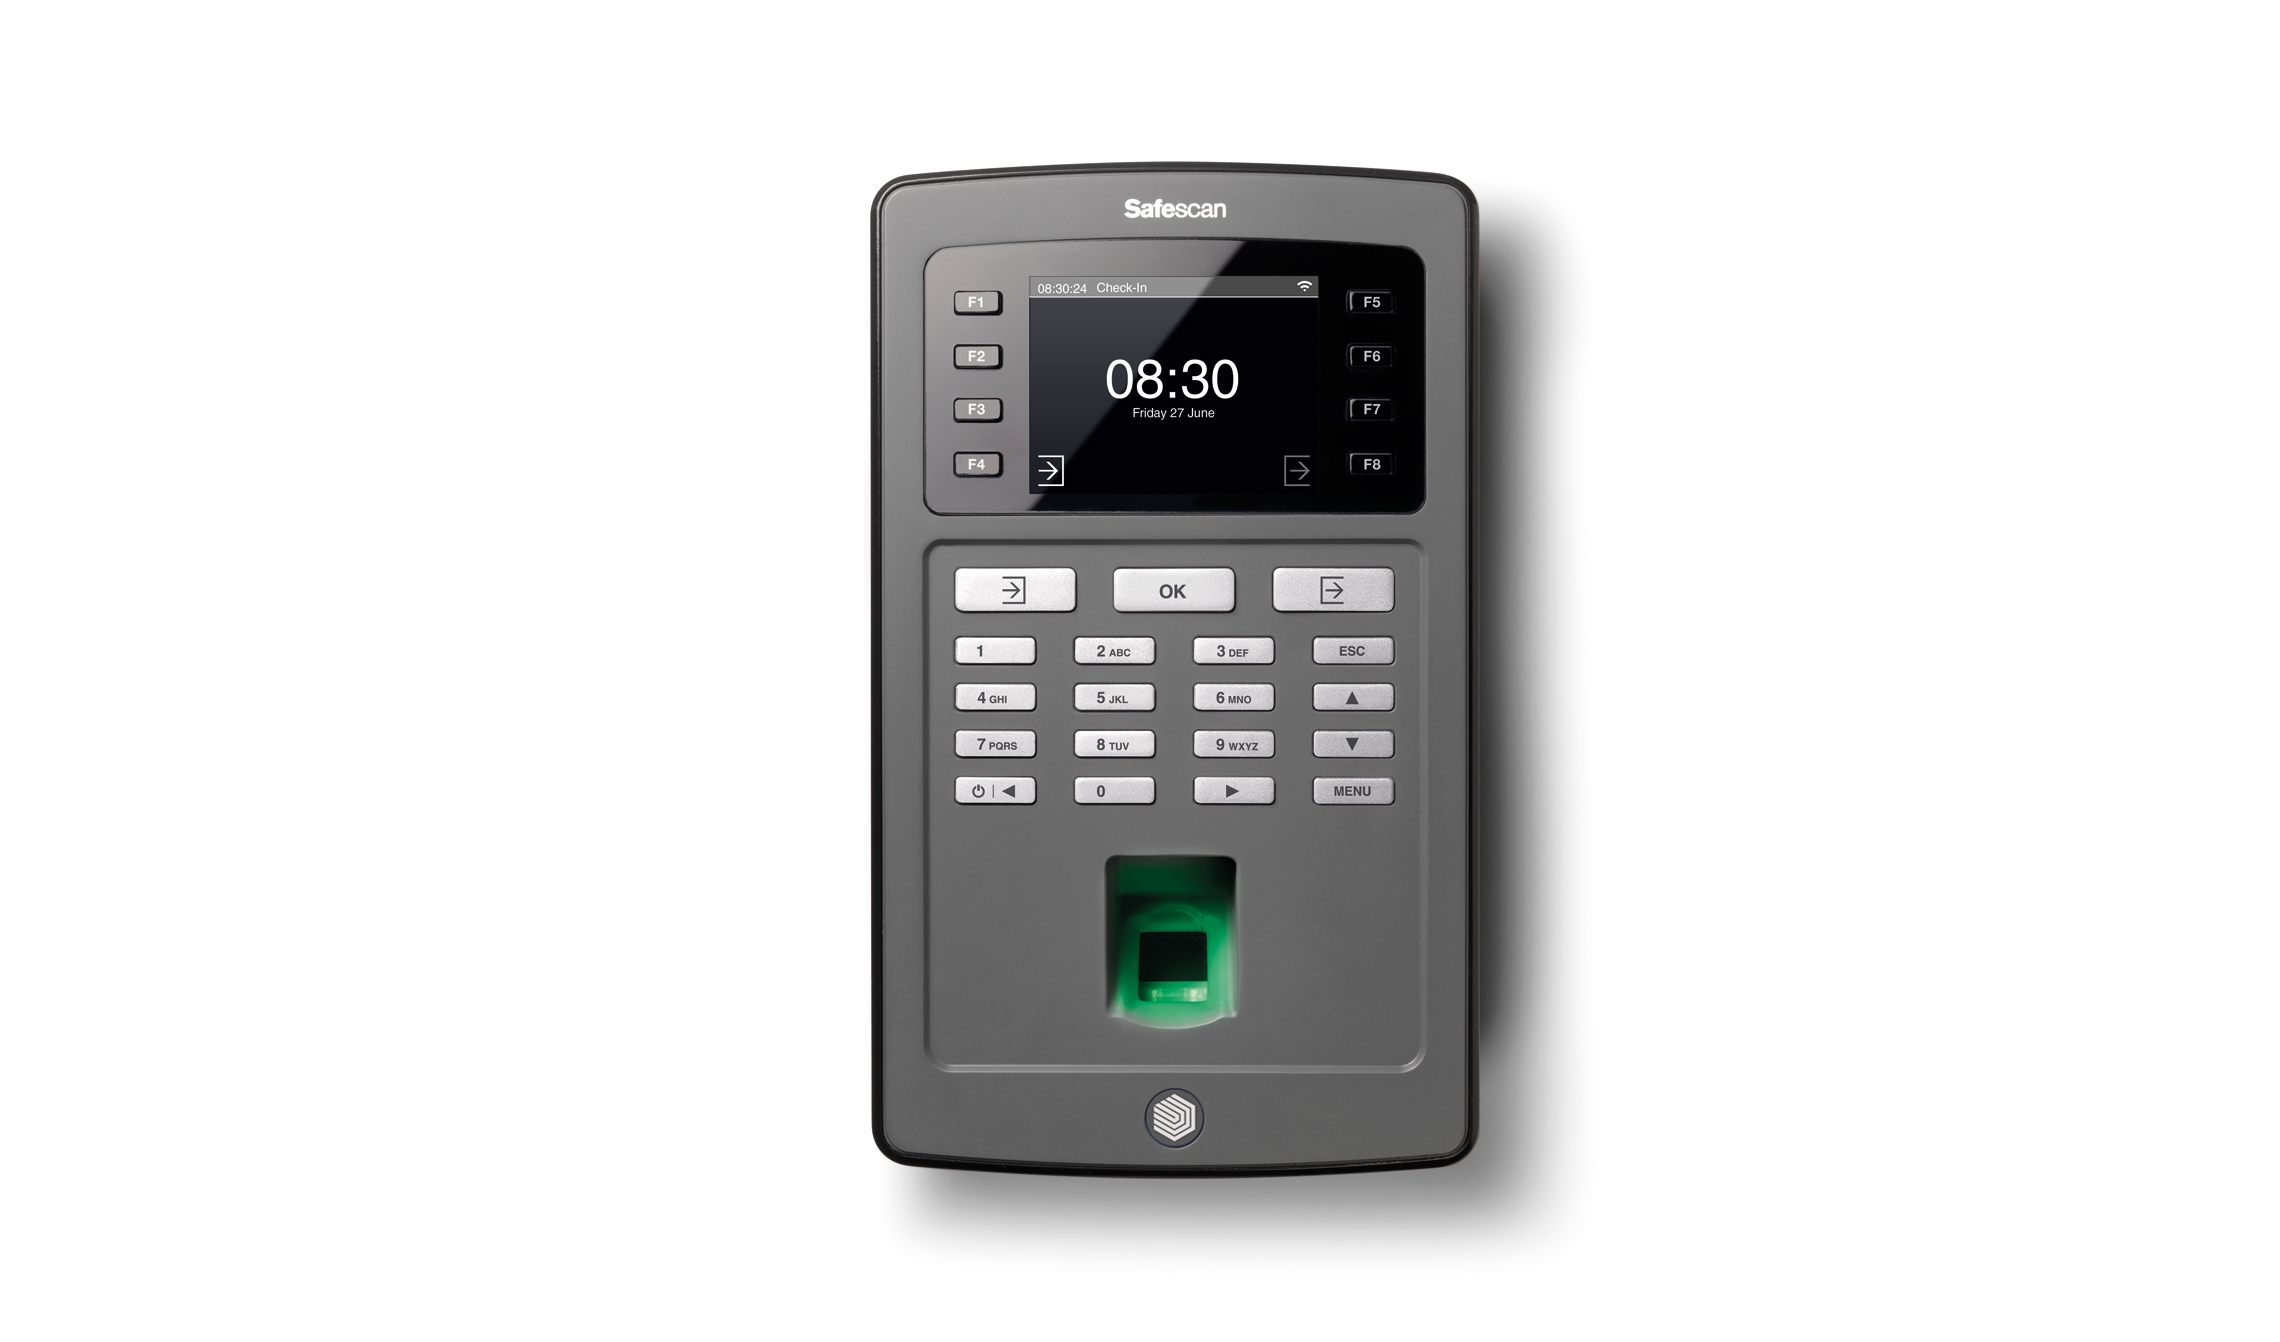 safescan-8025-black-wifi-time-attendance